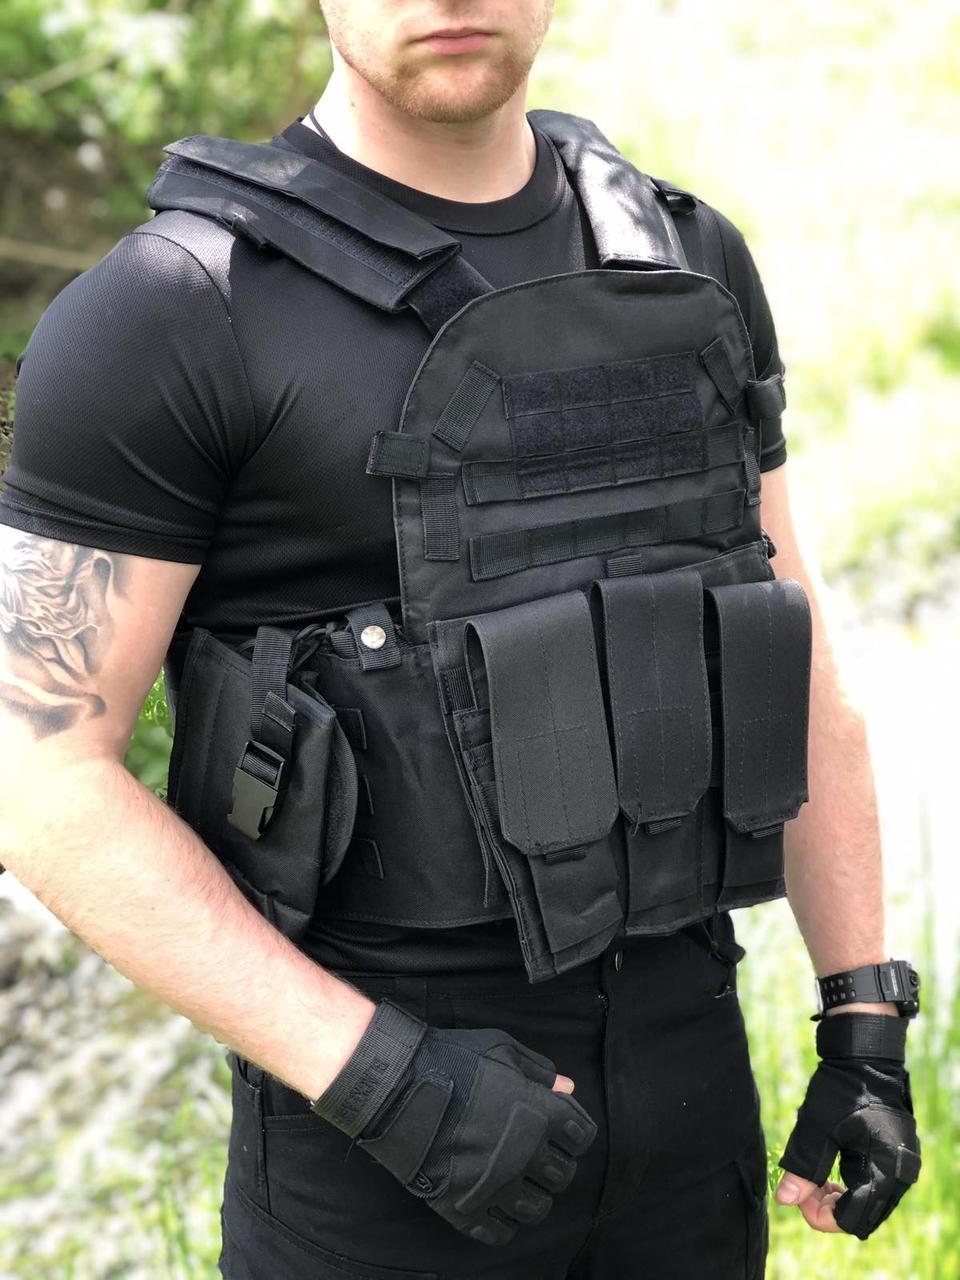 Армейский тактический разгрузочный жилет (разгрузка, плитконоска) с Molle, подсумками Материал оксфорд 800D